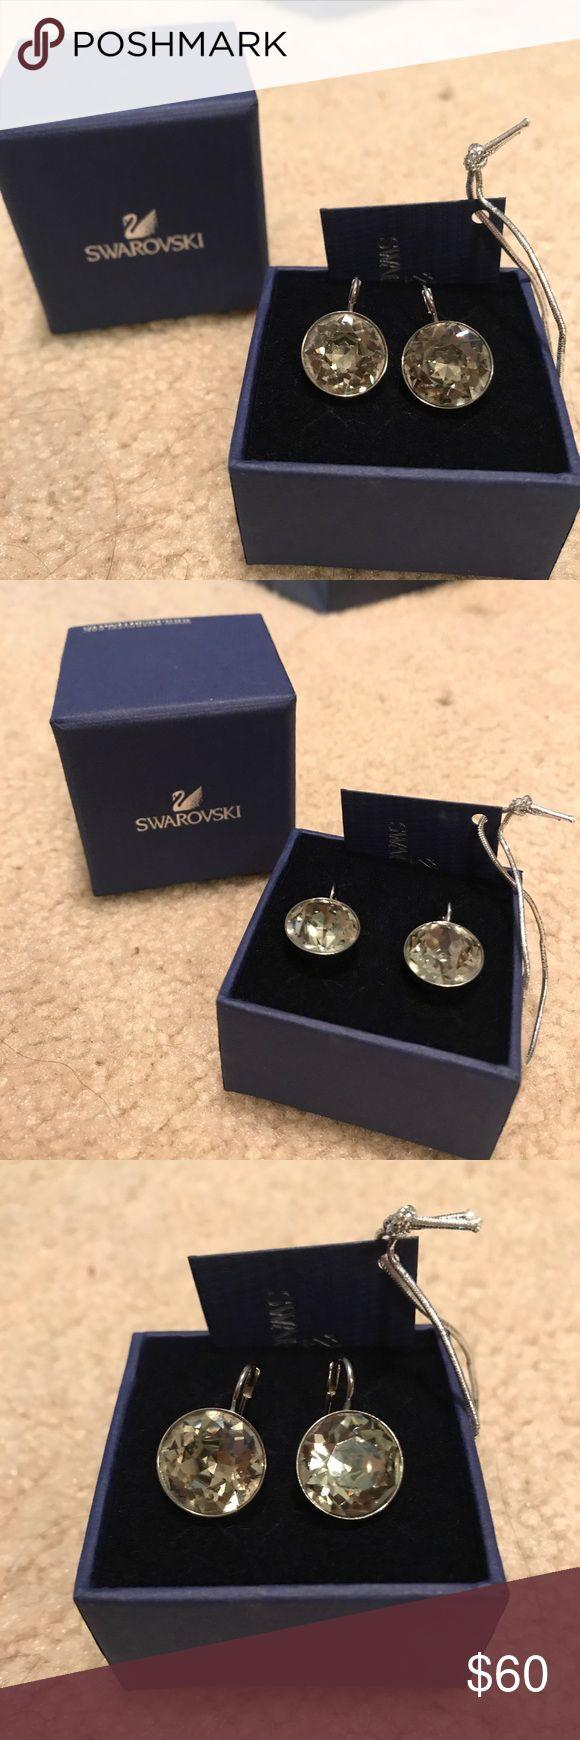 Swarovski Bella's Black Diamond Swarovski/ Bella's/ Color: Black Diamond Swarovski Jewelry Earrings